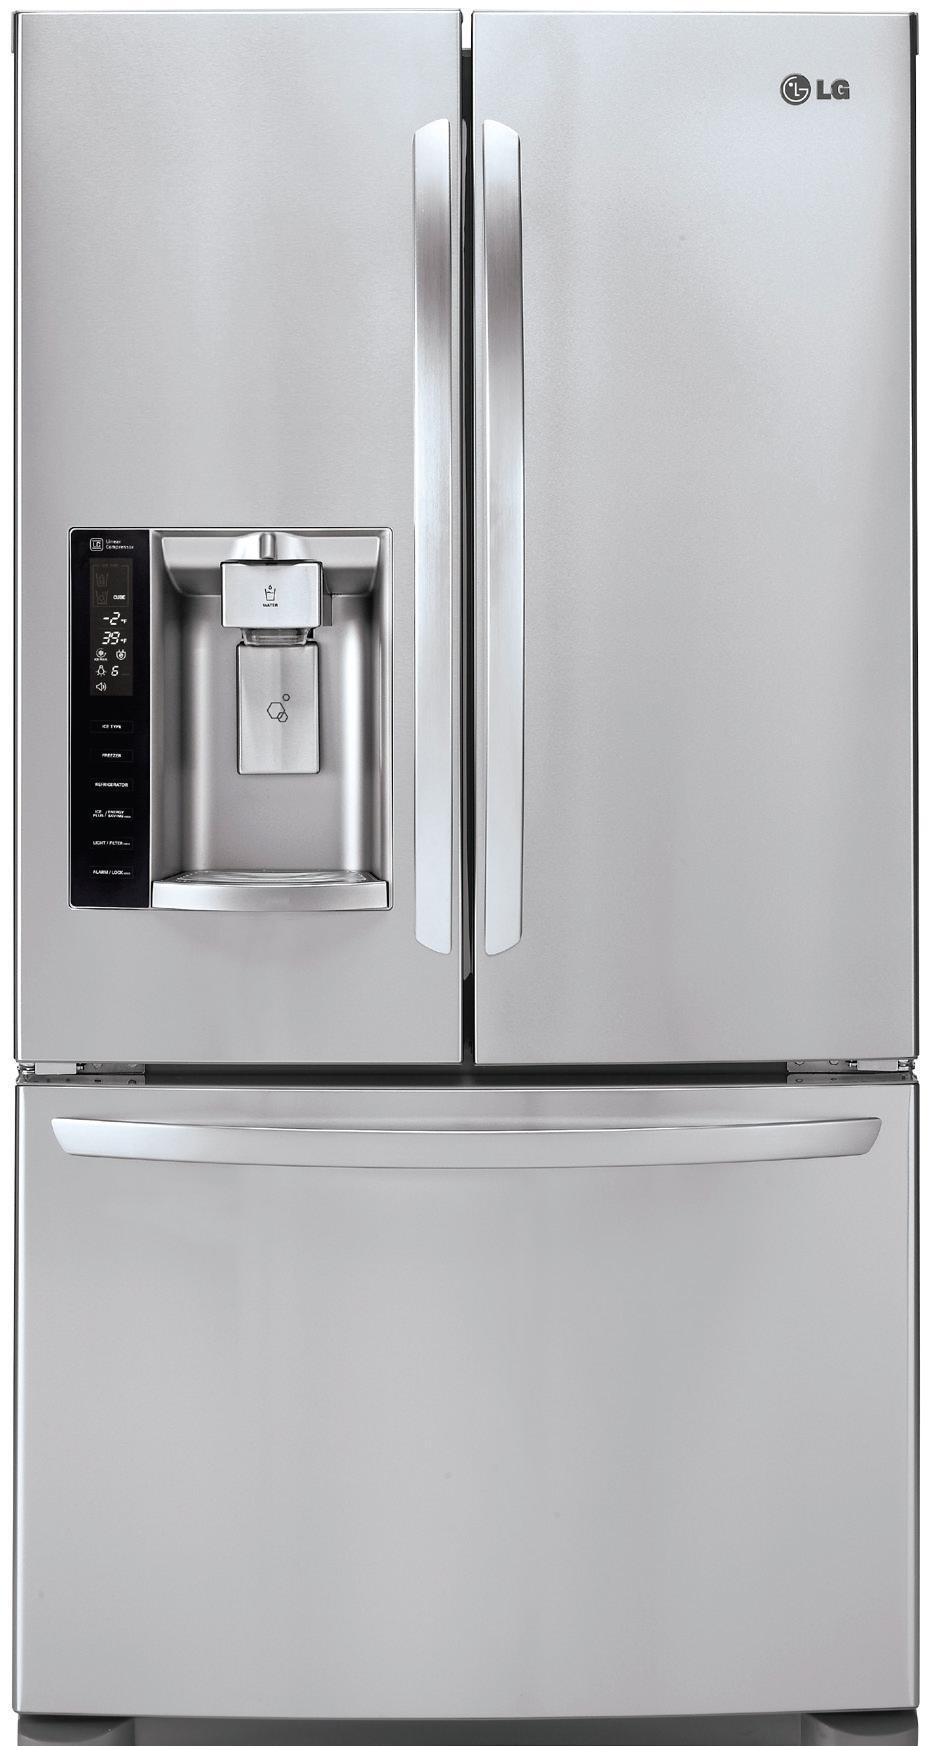 LG Appliances French Door Refrigerators 28 Cu. Ft. French Door Refrigerator - Item Number: LFX28968ST